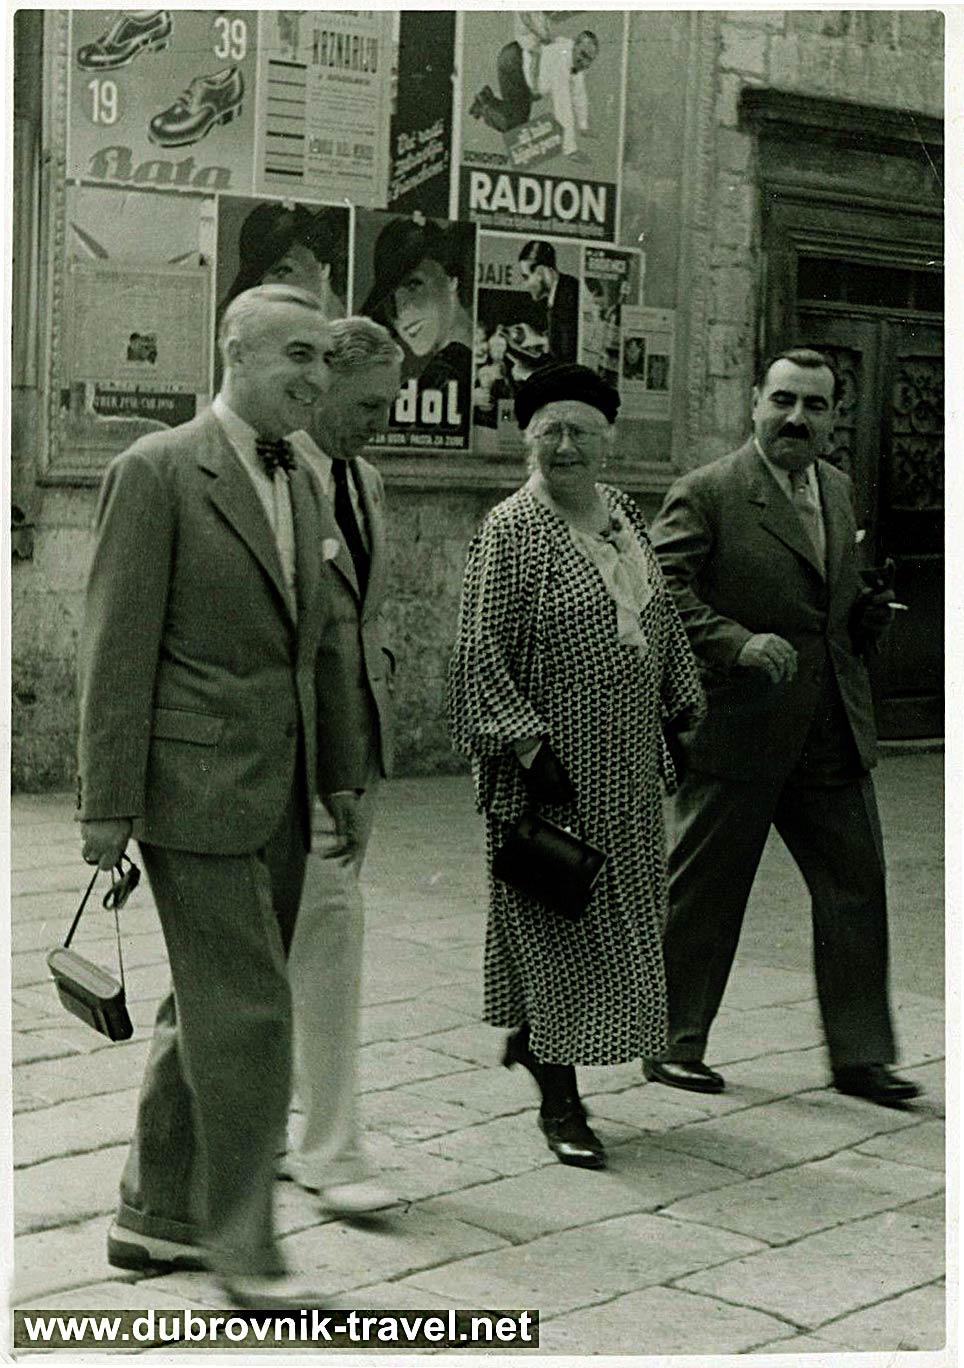 People and Adverts @ Stradun (1938)